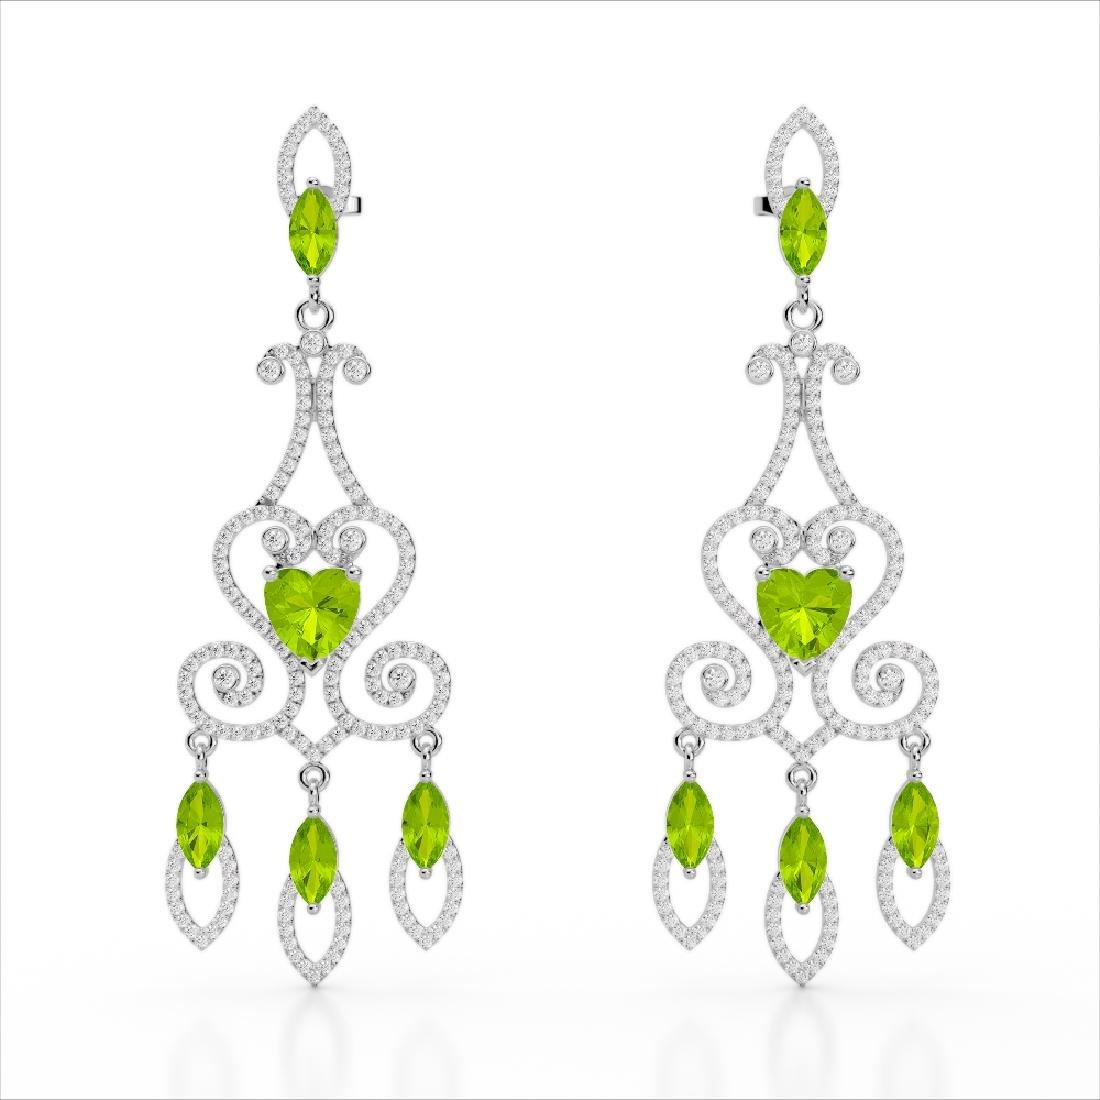 11 CTW Peridot & Micro Pave VS/SI Diamond Earrings 14K - 2